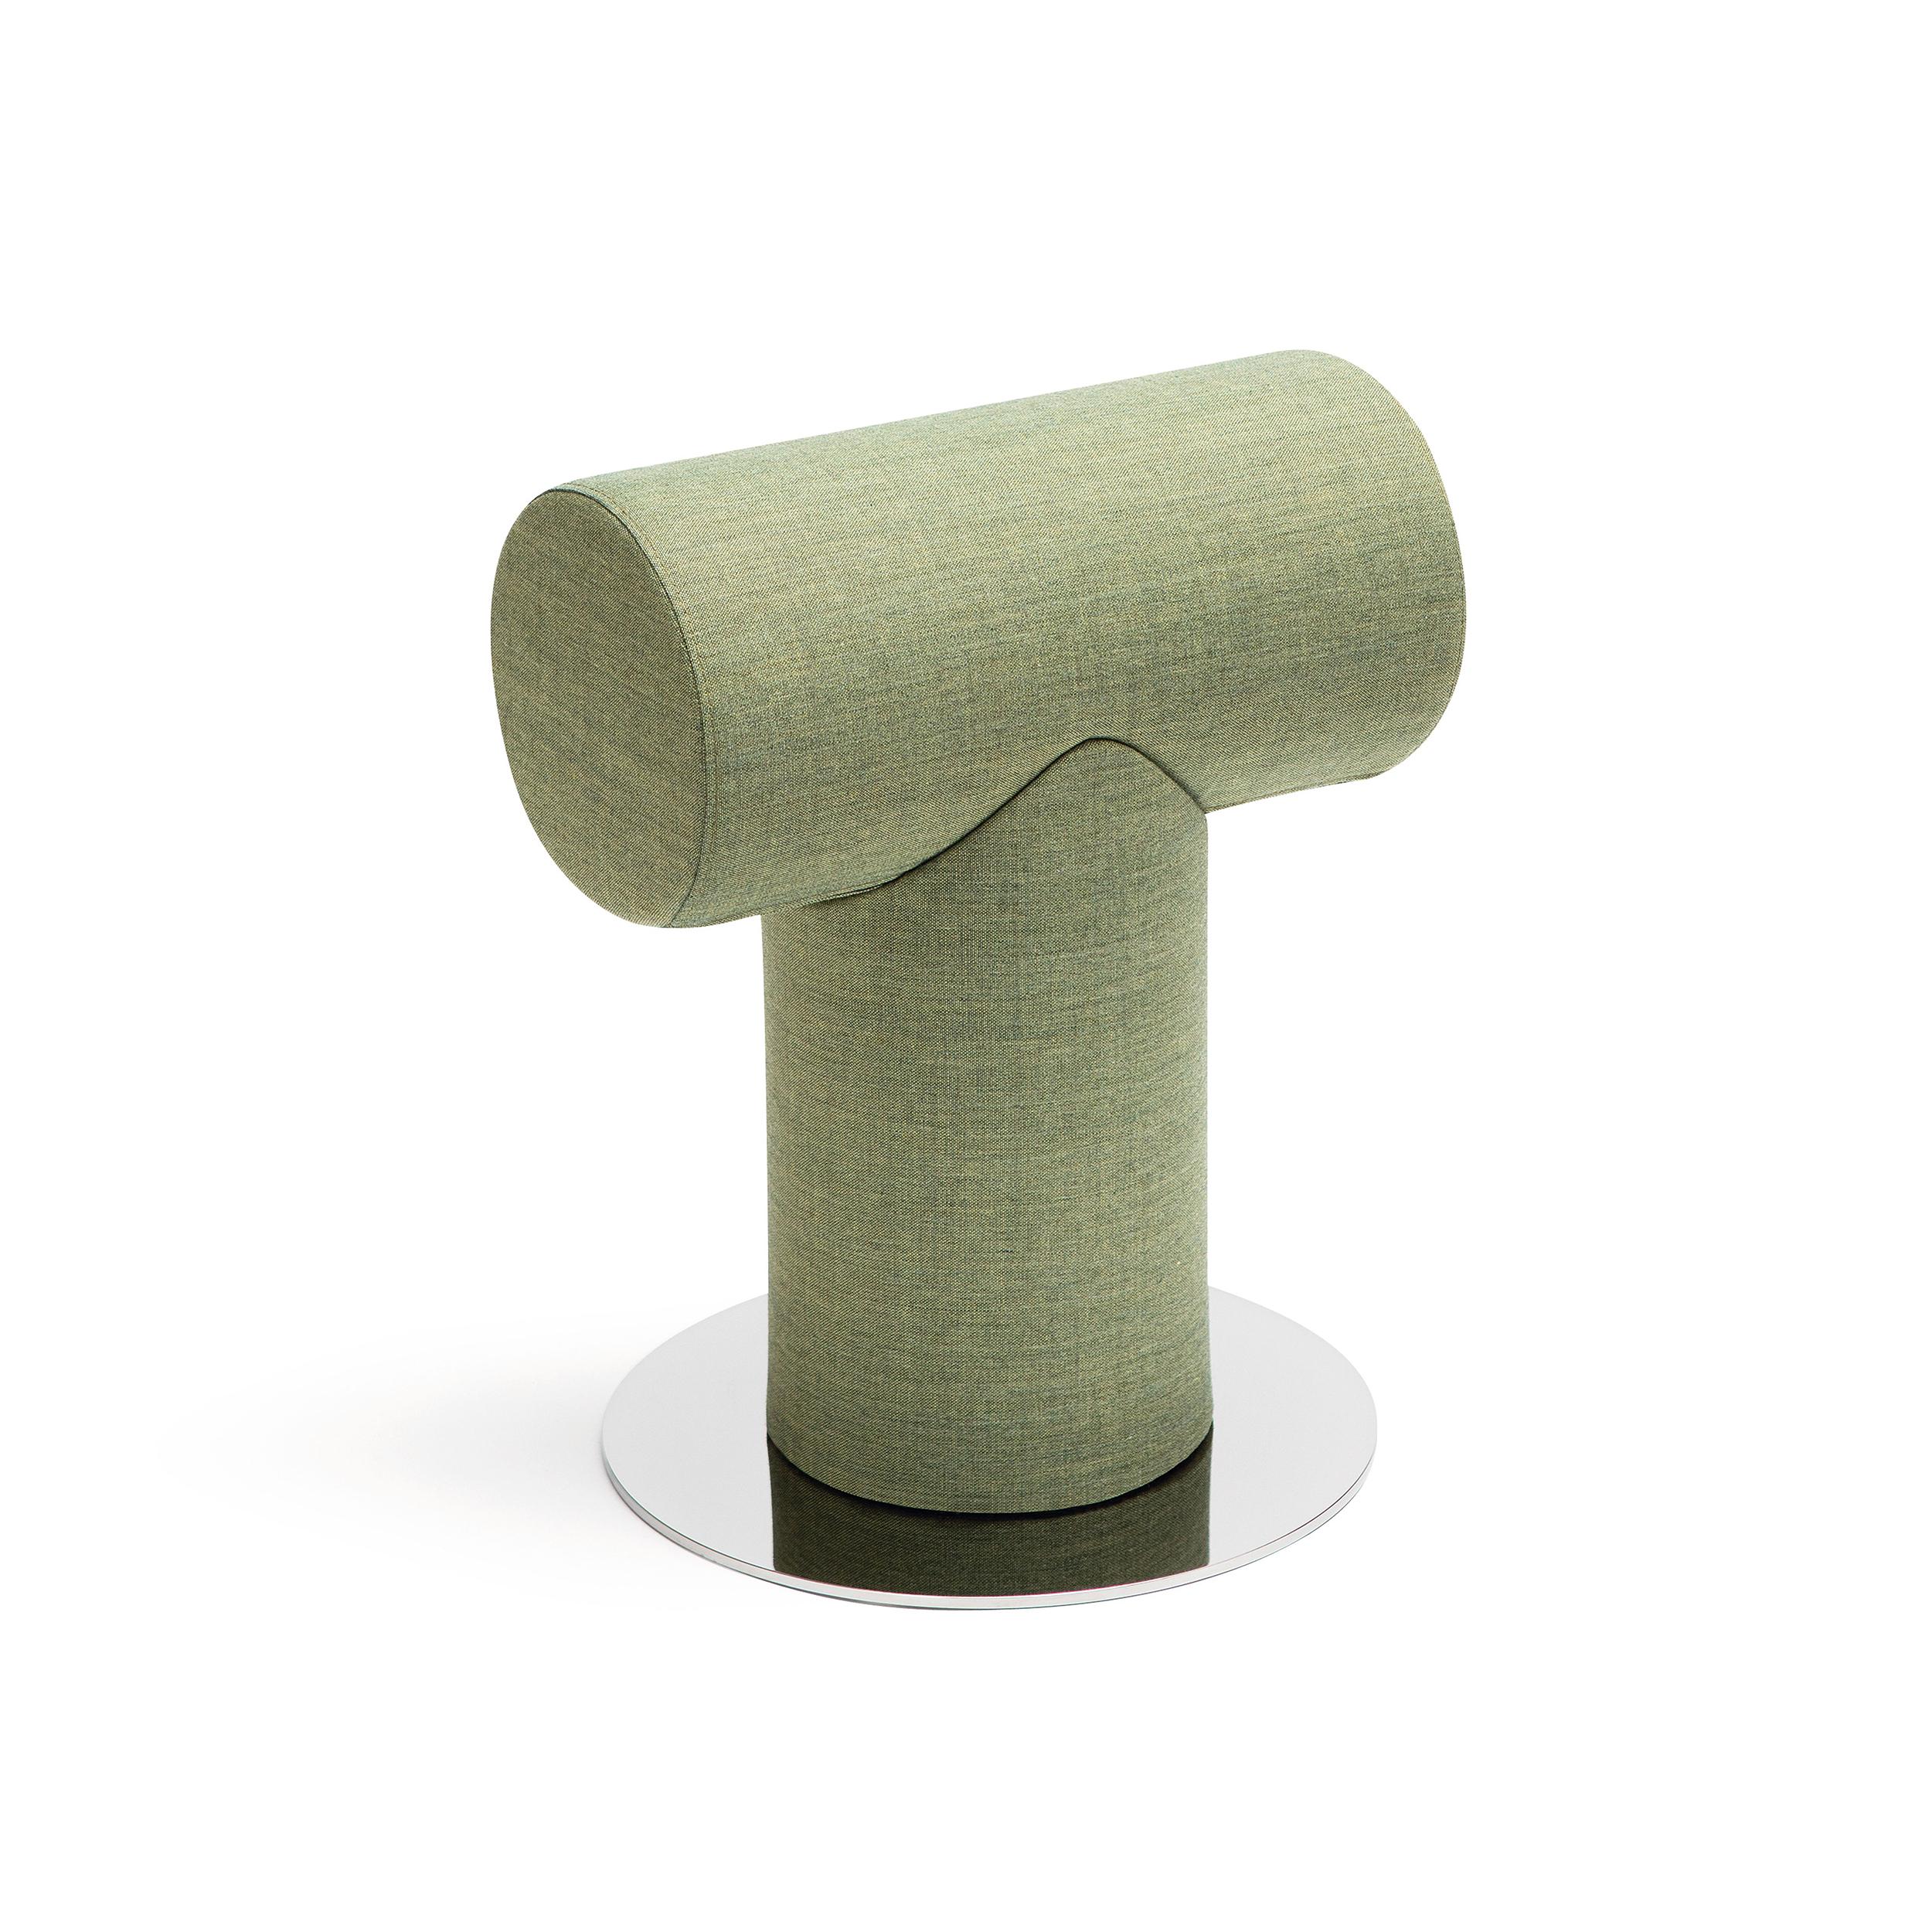 MATERIA-Mr-T-stool-h480-green.jpg